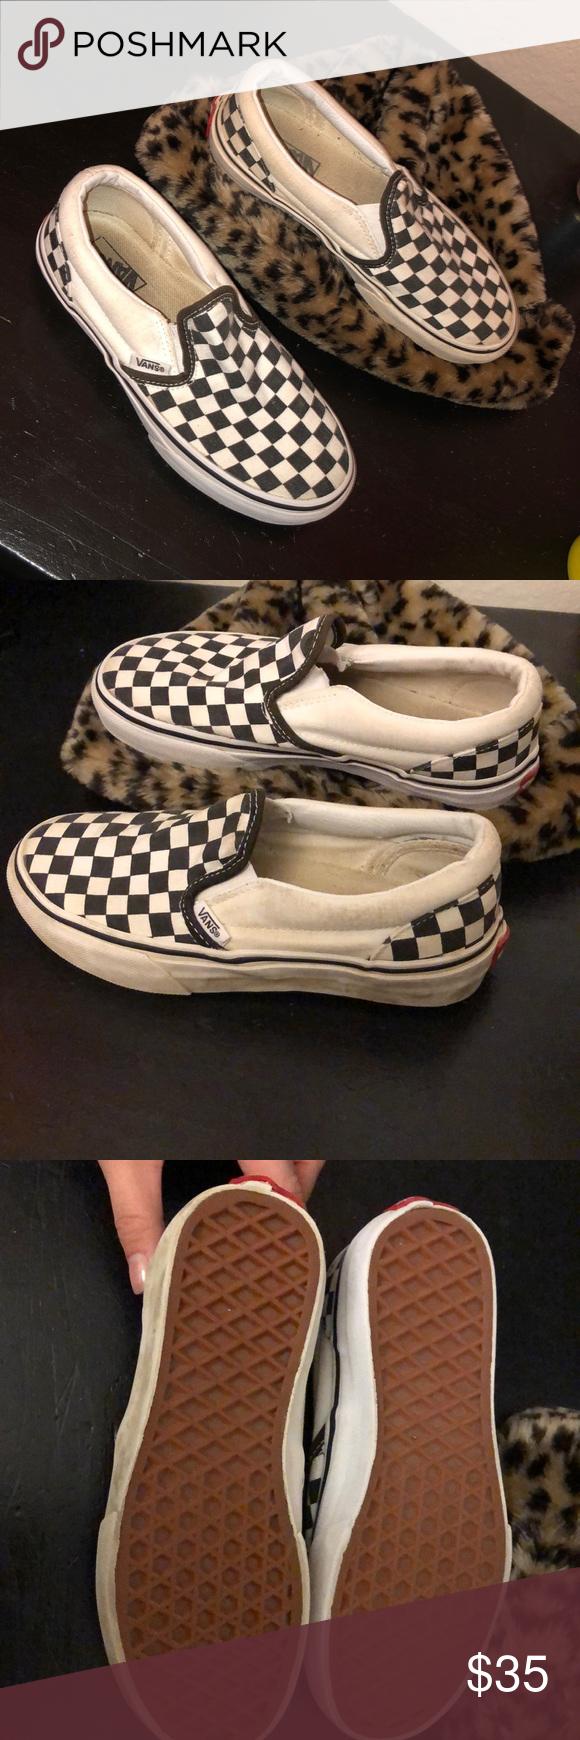 Checkered vans ( kids size 1.0 ) in